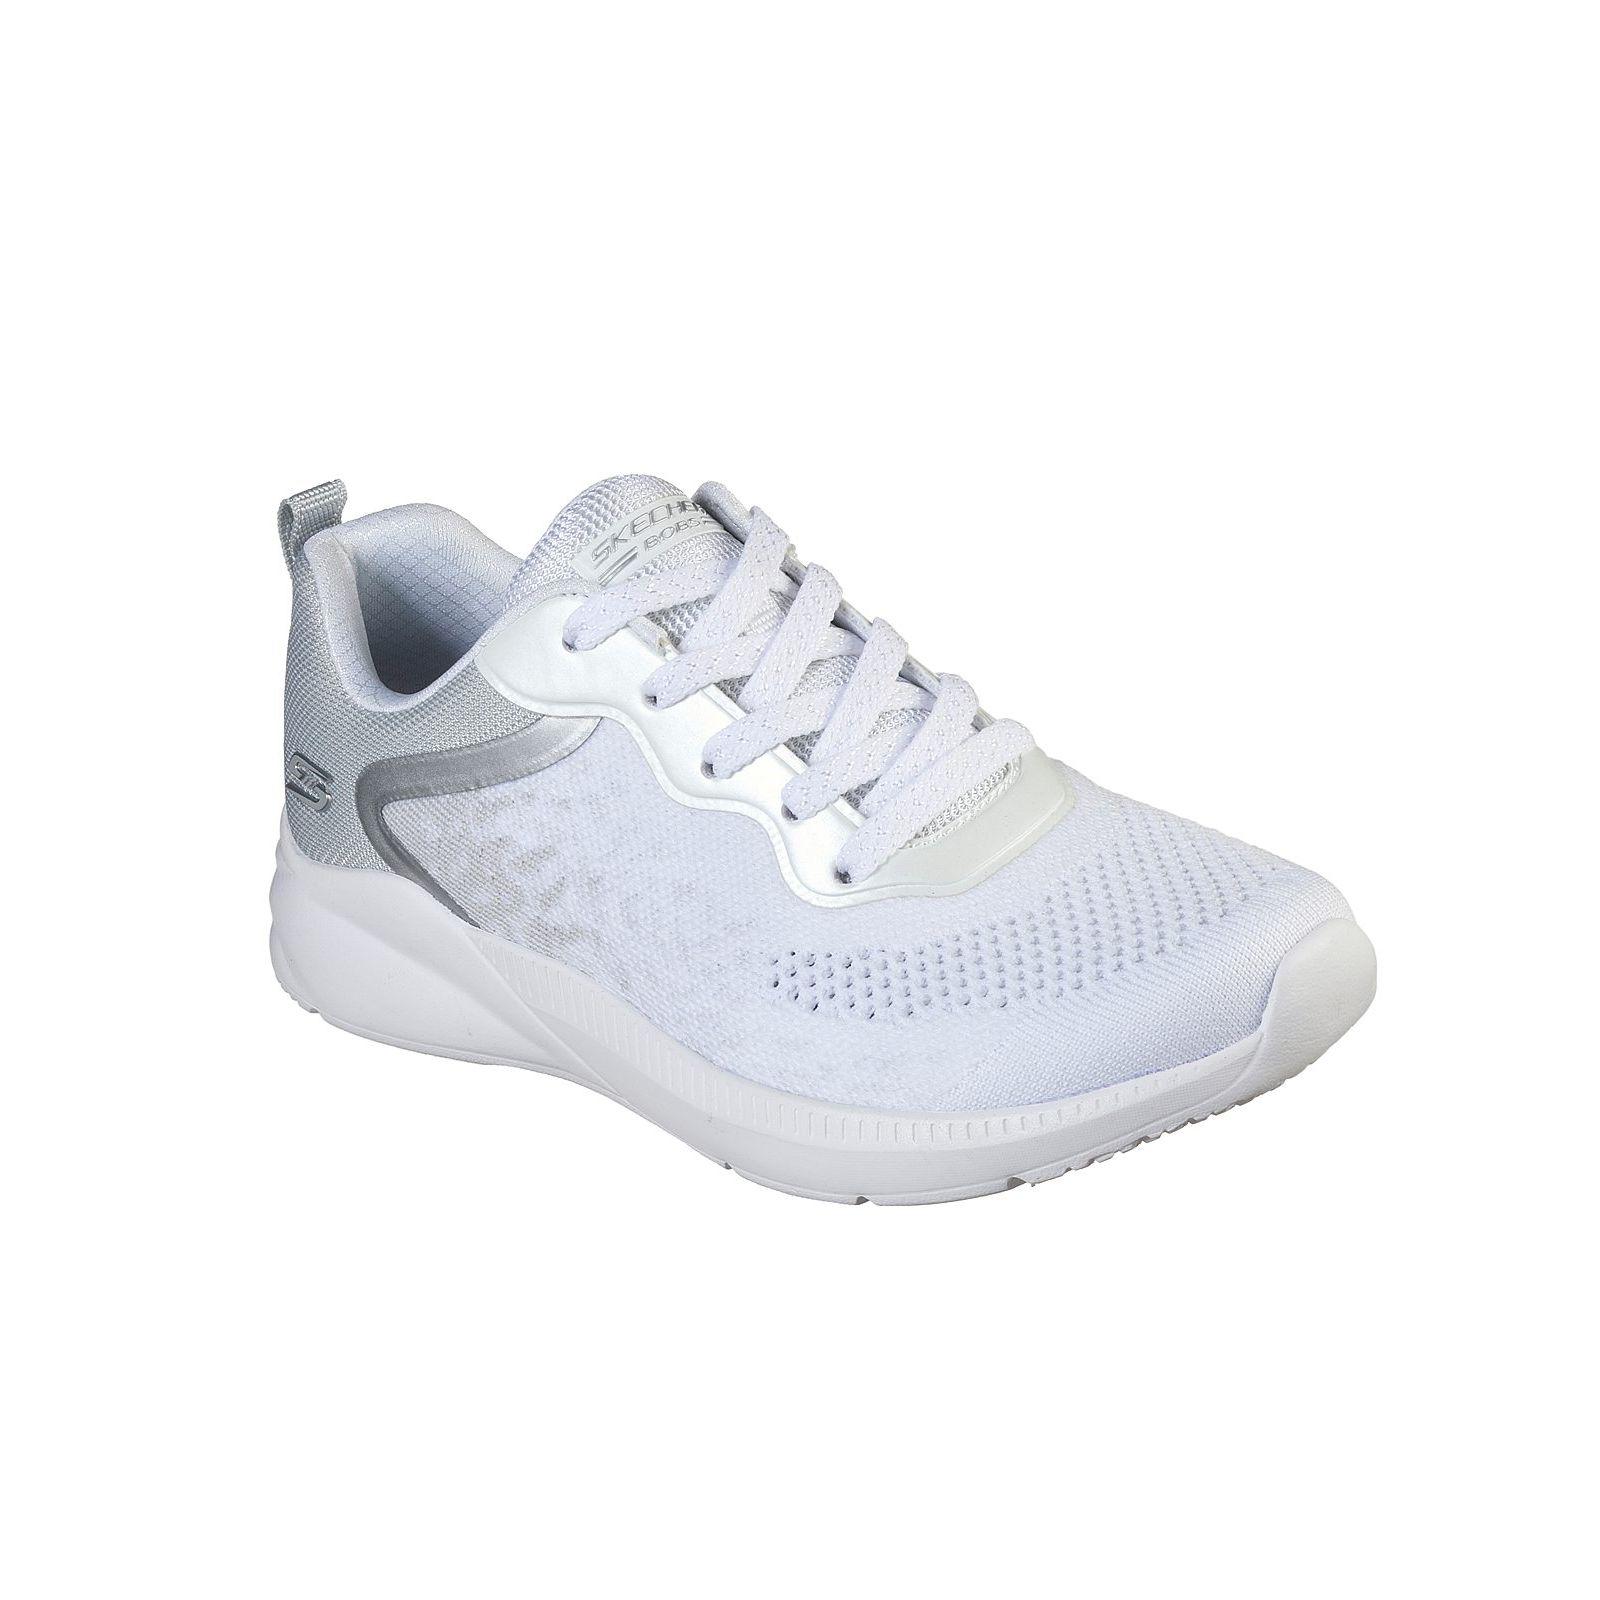 Baskets Femme Skechers Bobs Sport Ariana (117010) couleur blanche vue ensemble